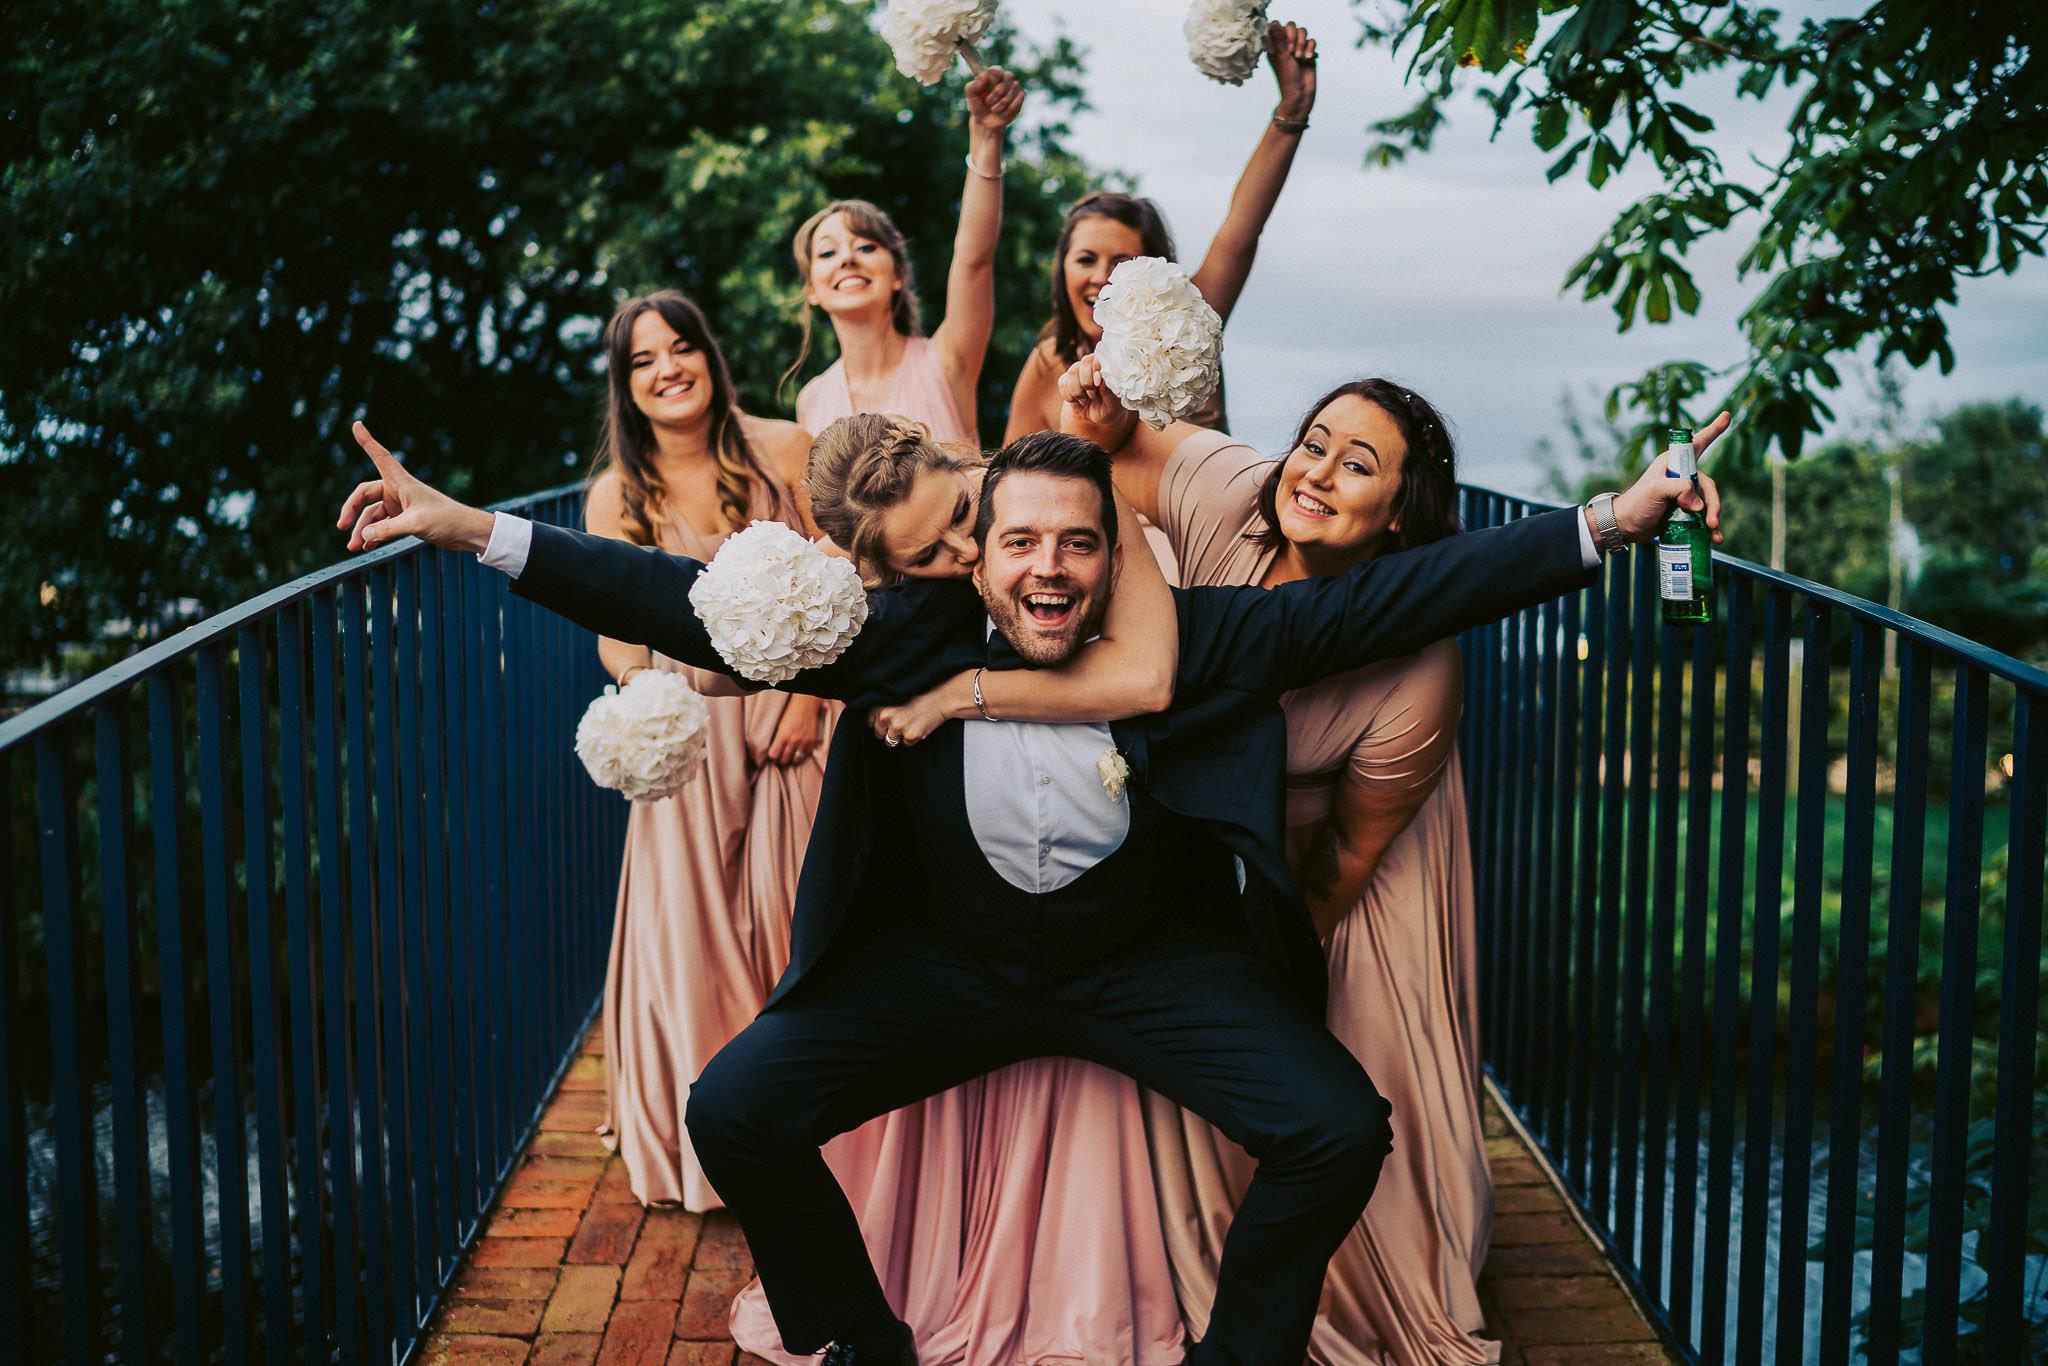 Staffordshire-Wedding-Photographer-247.jpg